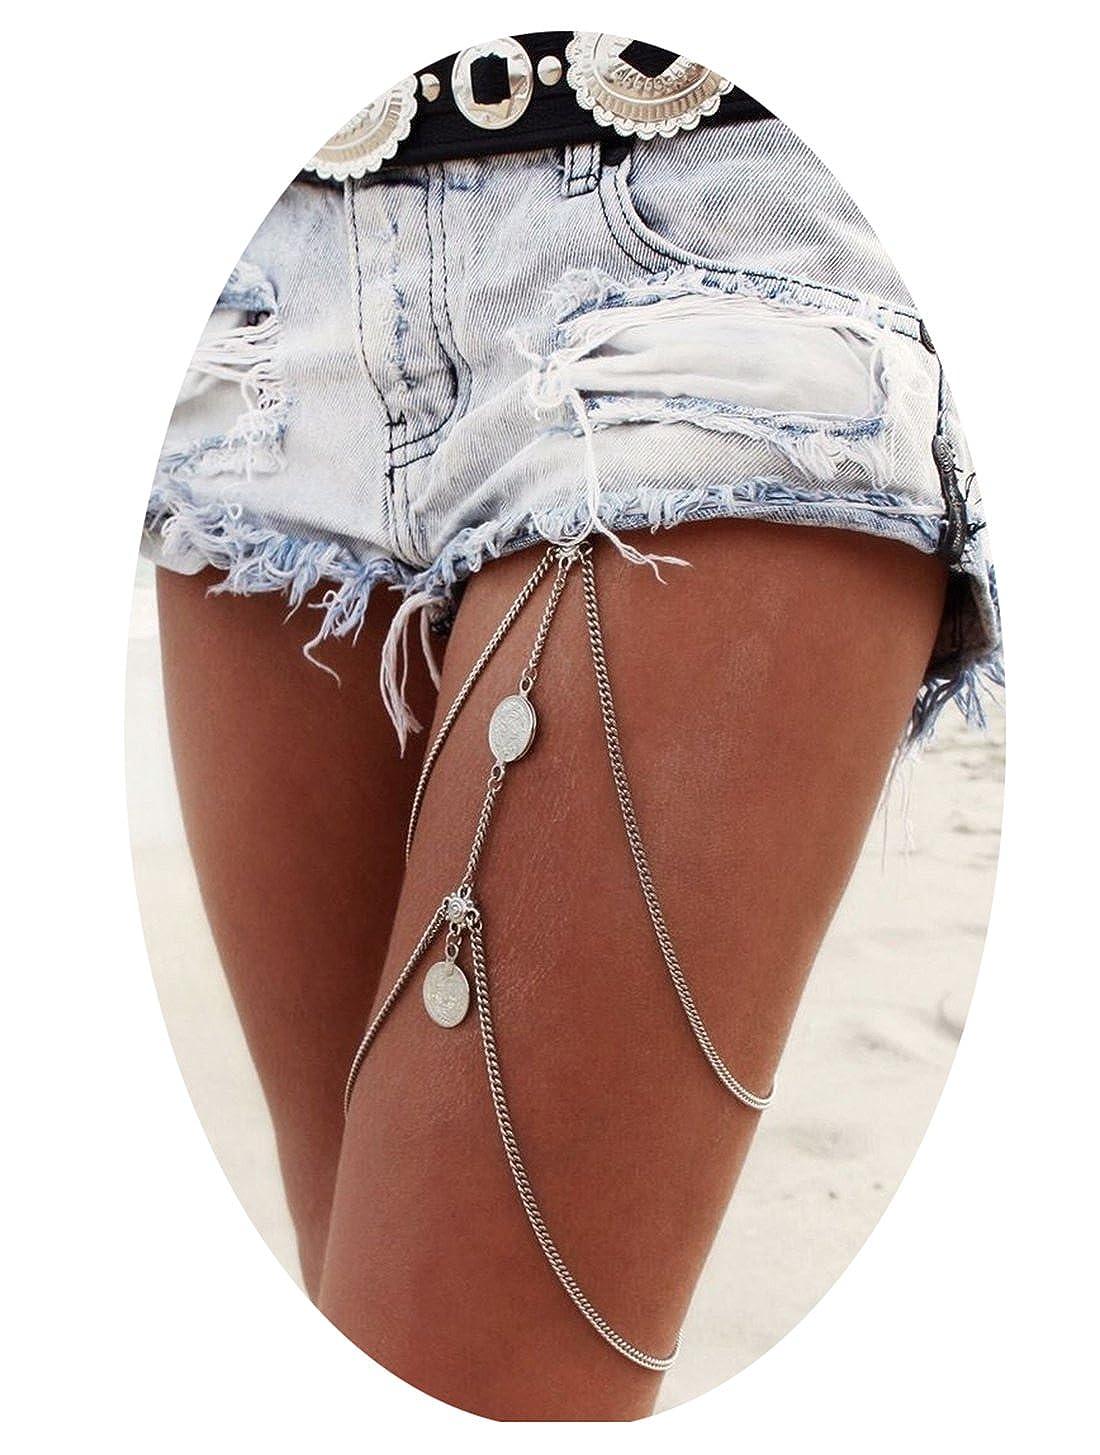 Tupai 1PC Vintage Silver Stretchy Bikini Thigh Leg Tassel Chains Coins Pendant Crossover Body Jewelry Yi wu Tu Pai Electronic Commerce Co.LTD TU20170502601